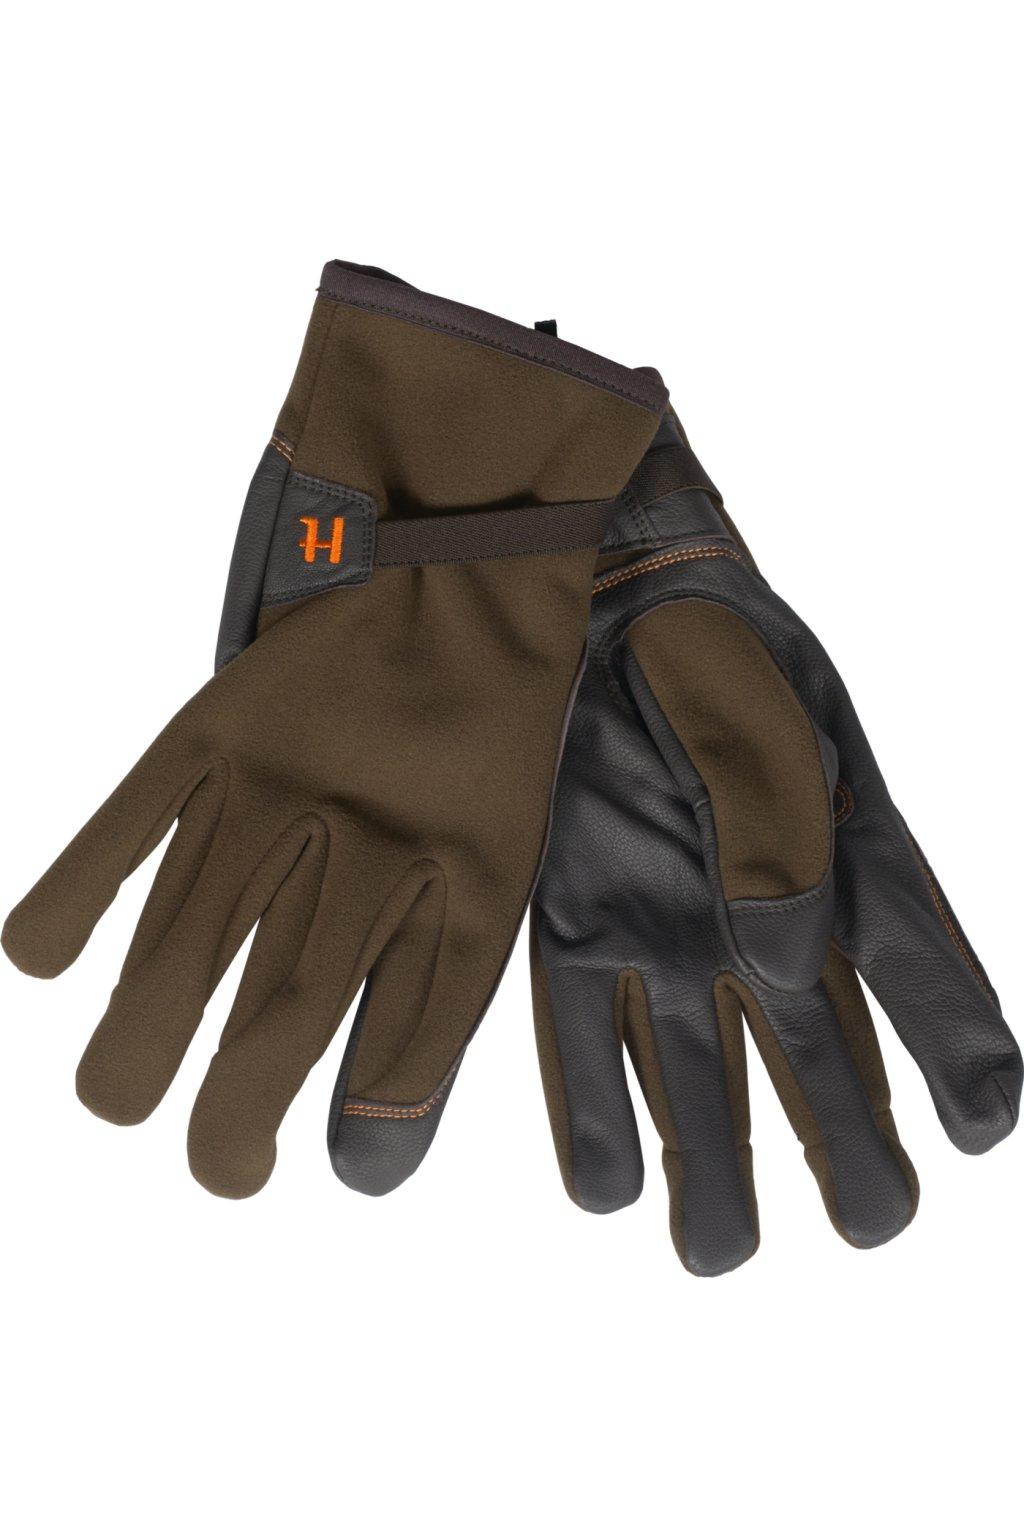 Härkila - Wildboar Pro rukavice